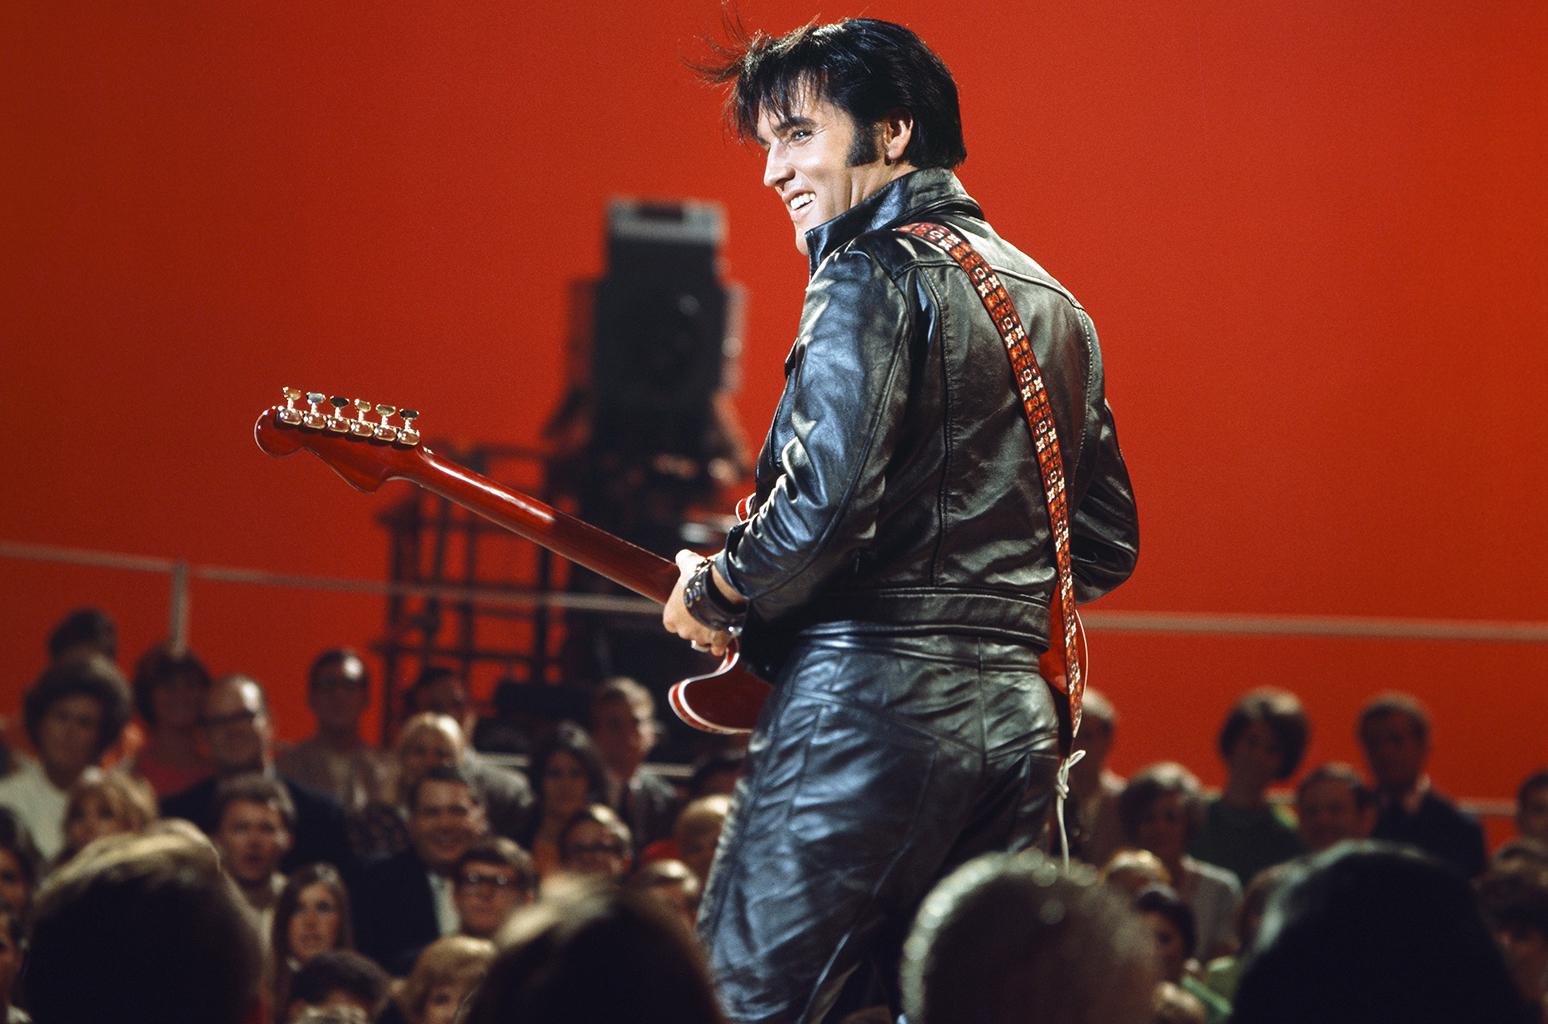 Elvis Presley has left the building